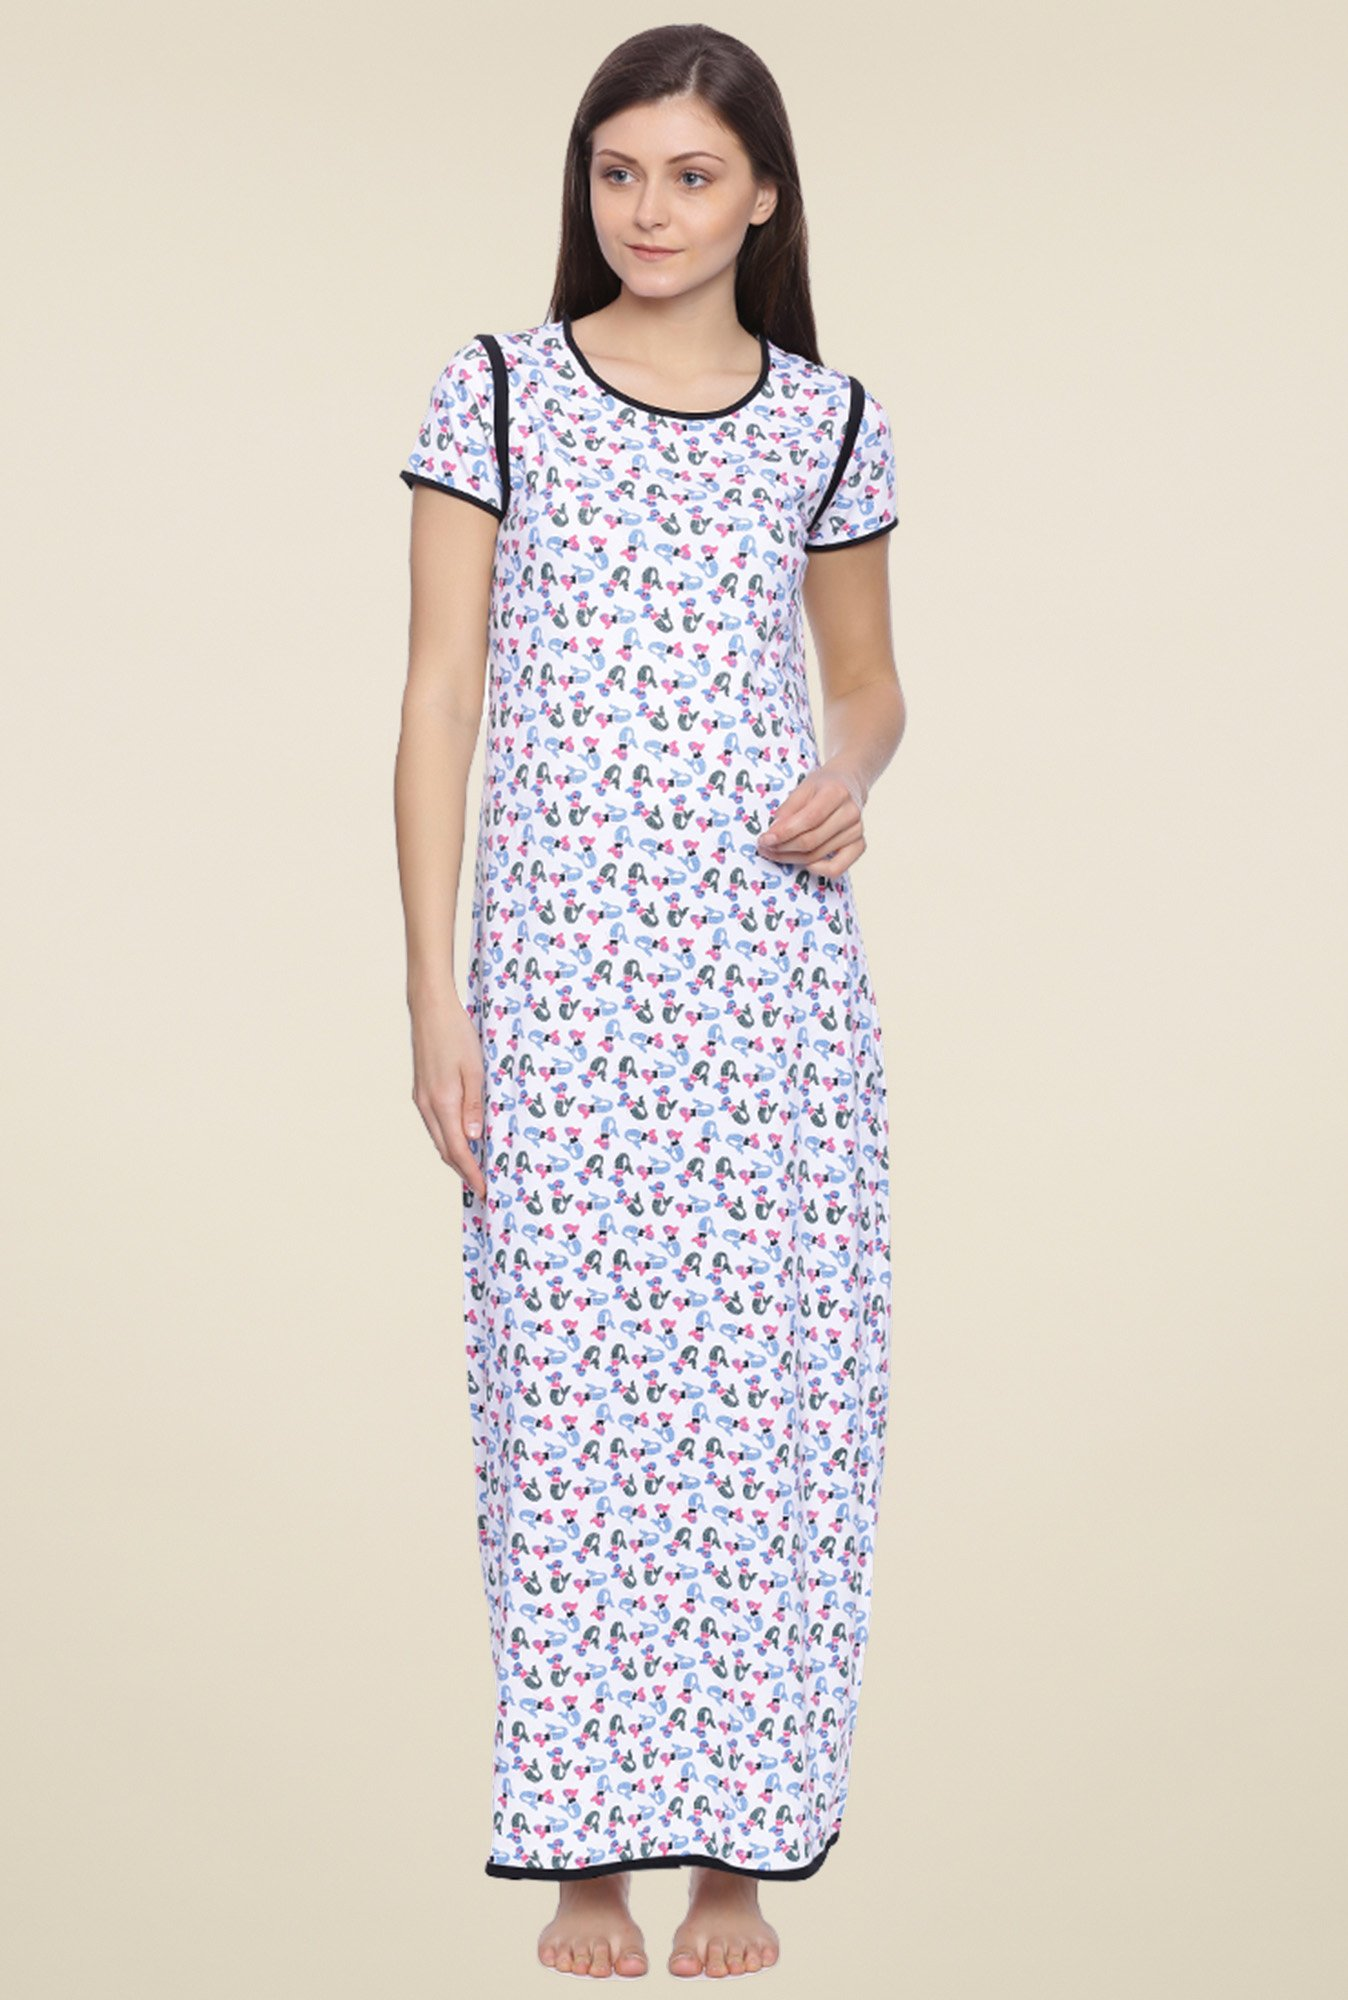 Buy Zivame White Printed Cotton Nighty for Women Online   Tata CLiQ c61644bf78